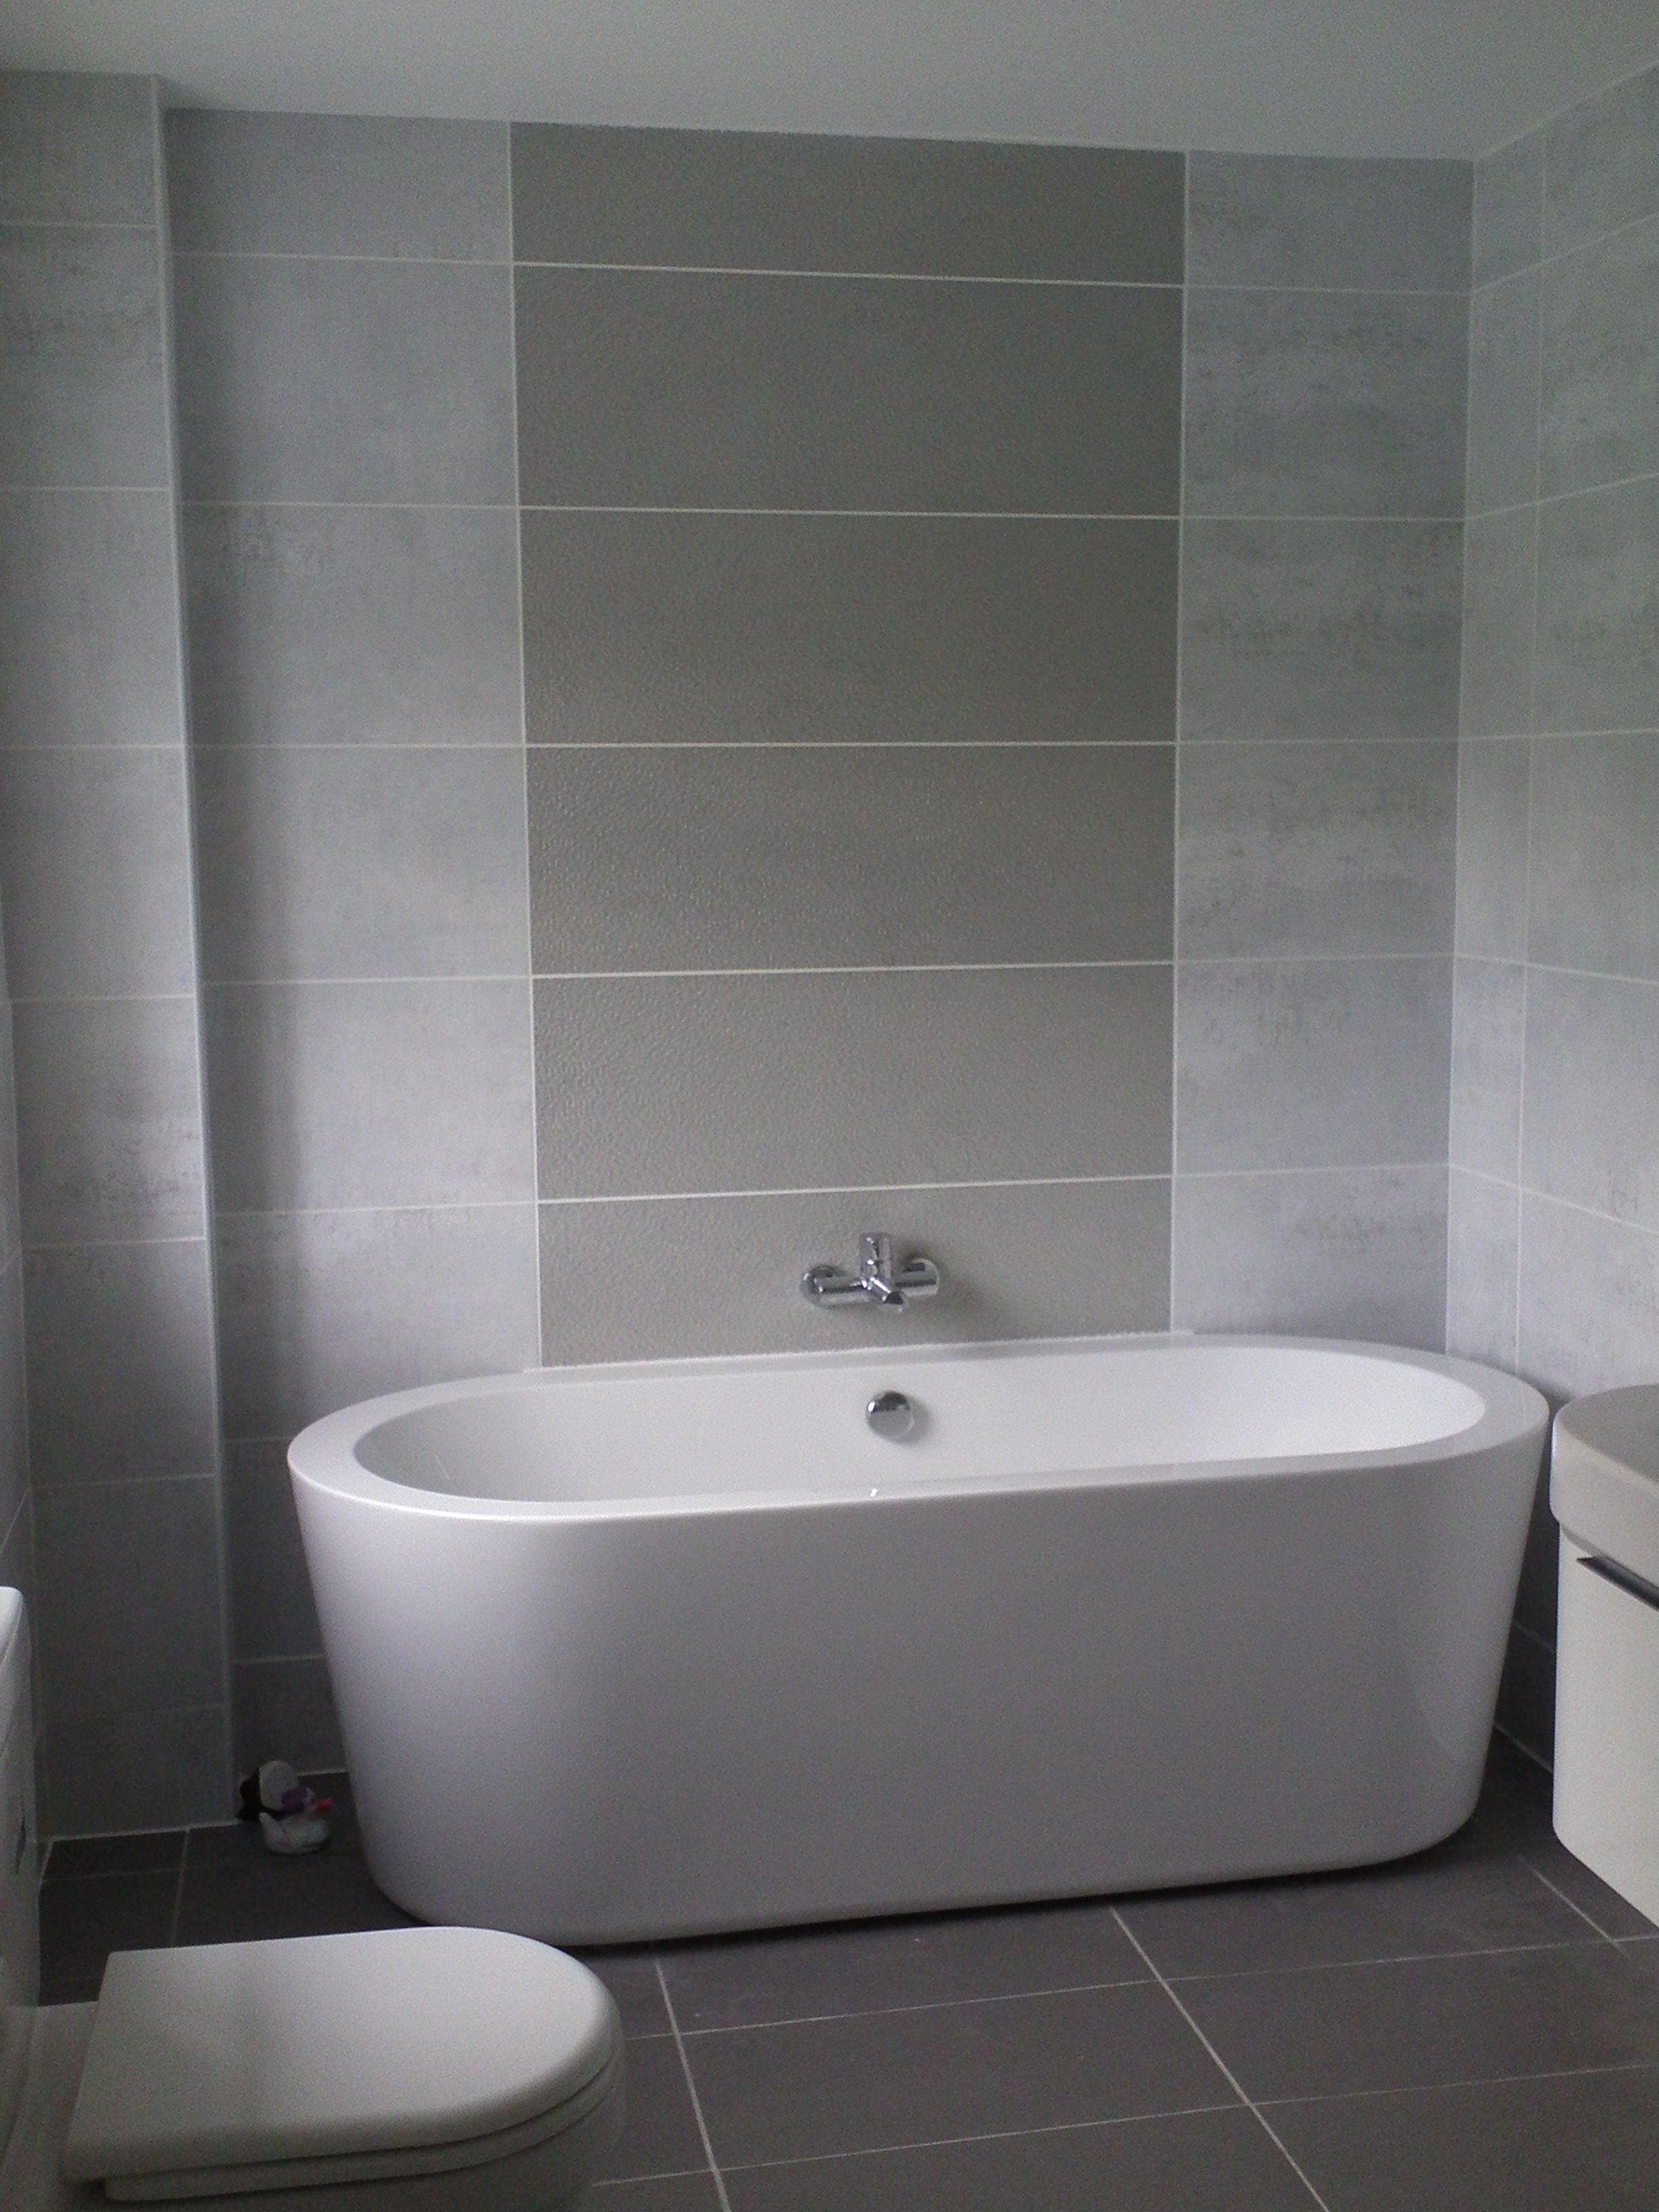 Grey Tile Bathroom Designs Ideas Featuring Gray Ceramic Floor And For Gray Tile Bathroom Grey Bathroom Tiles Small Bathroom Inspiration Bathroom Tile Designs